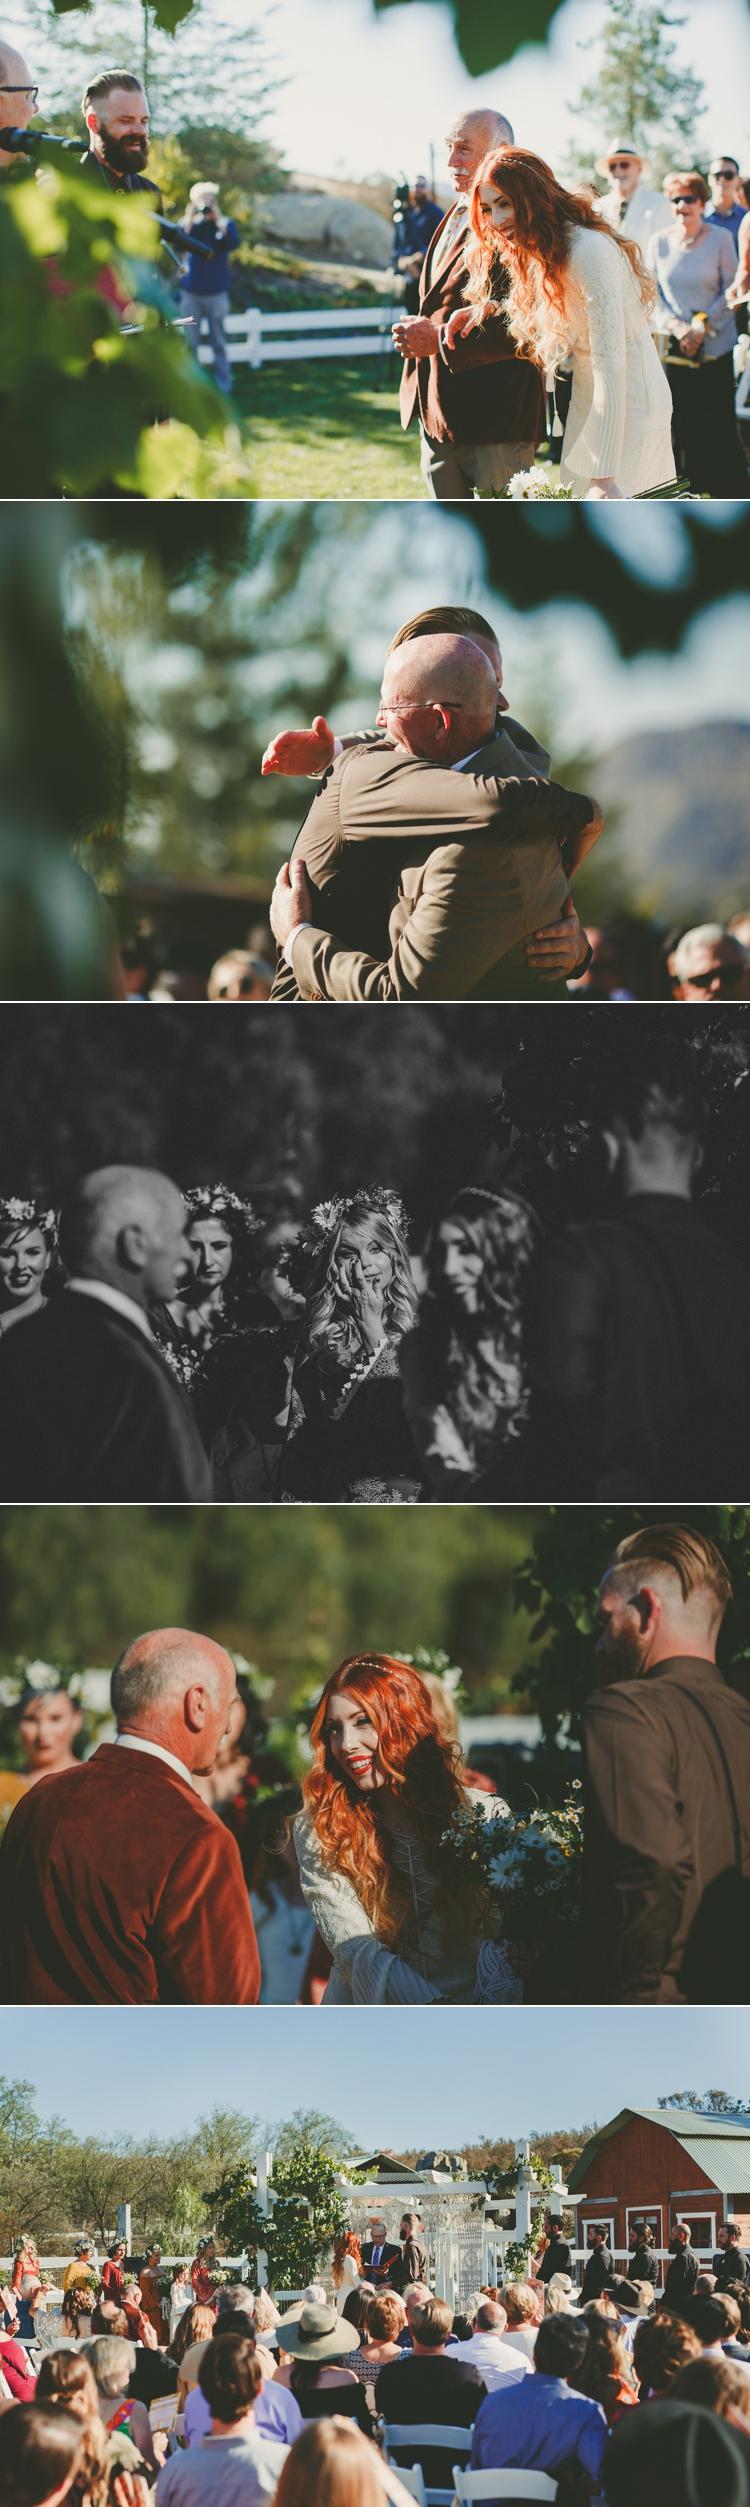 woodstock-inspired-wedding-photos-13